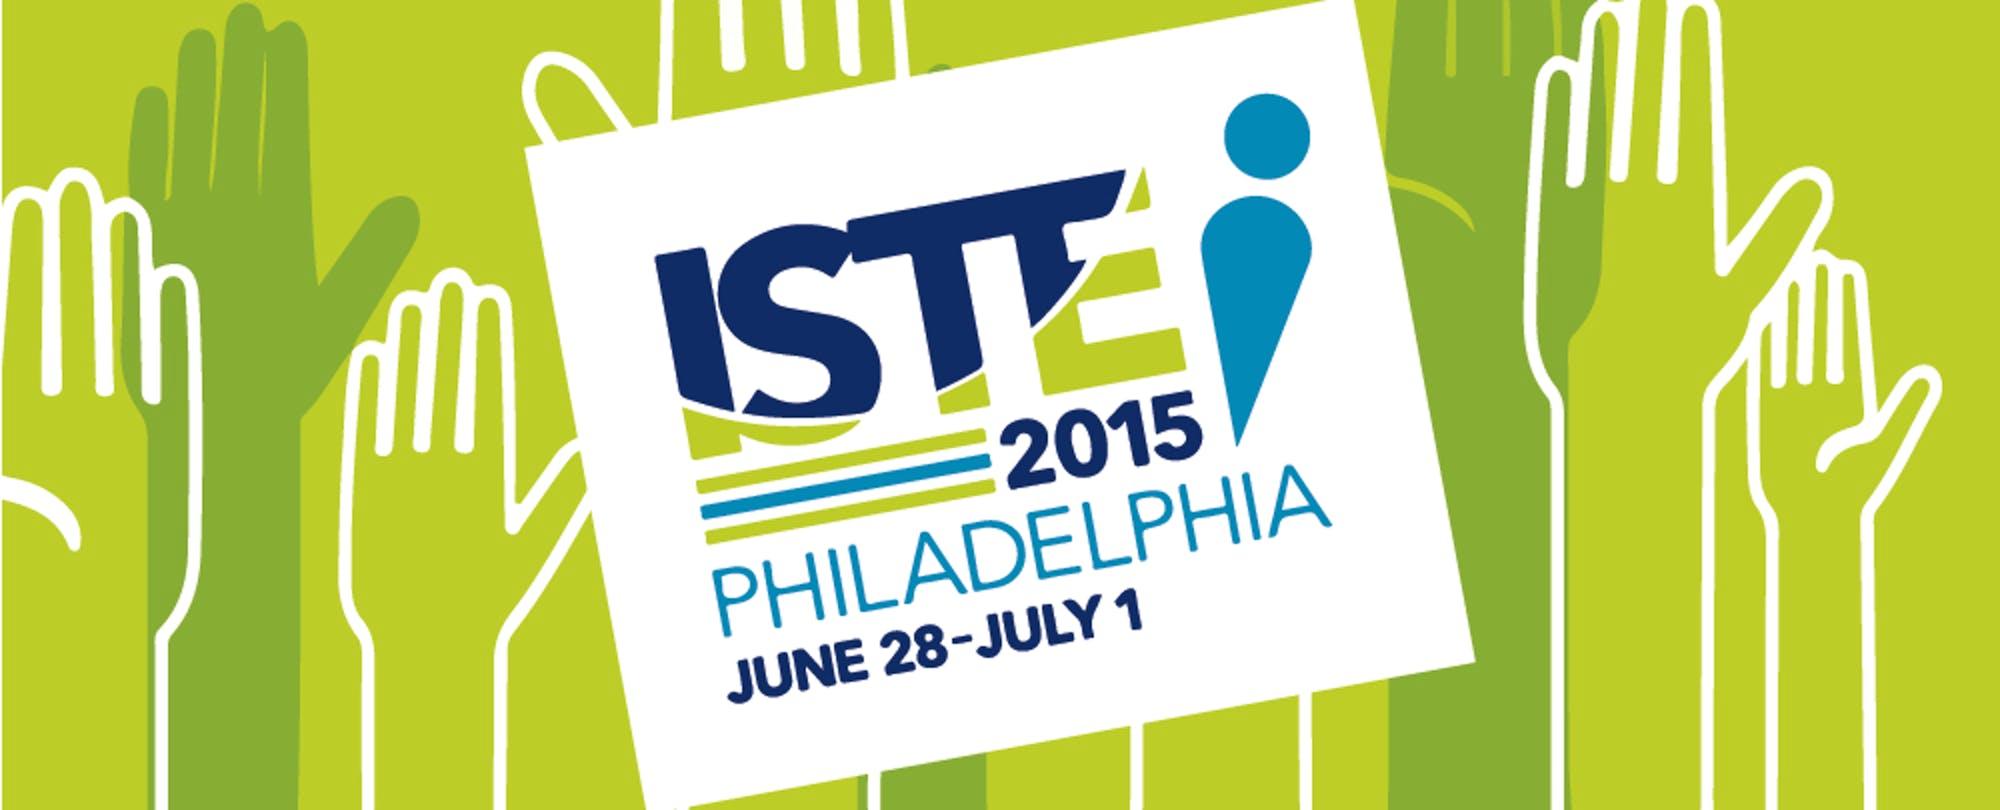 Navigating ISTE 2015: A Cheatsheet for Beginners